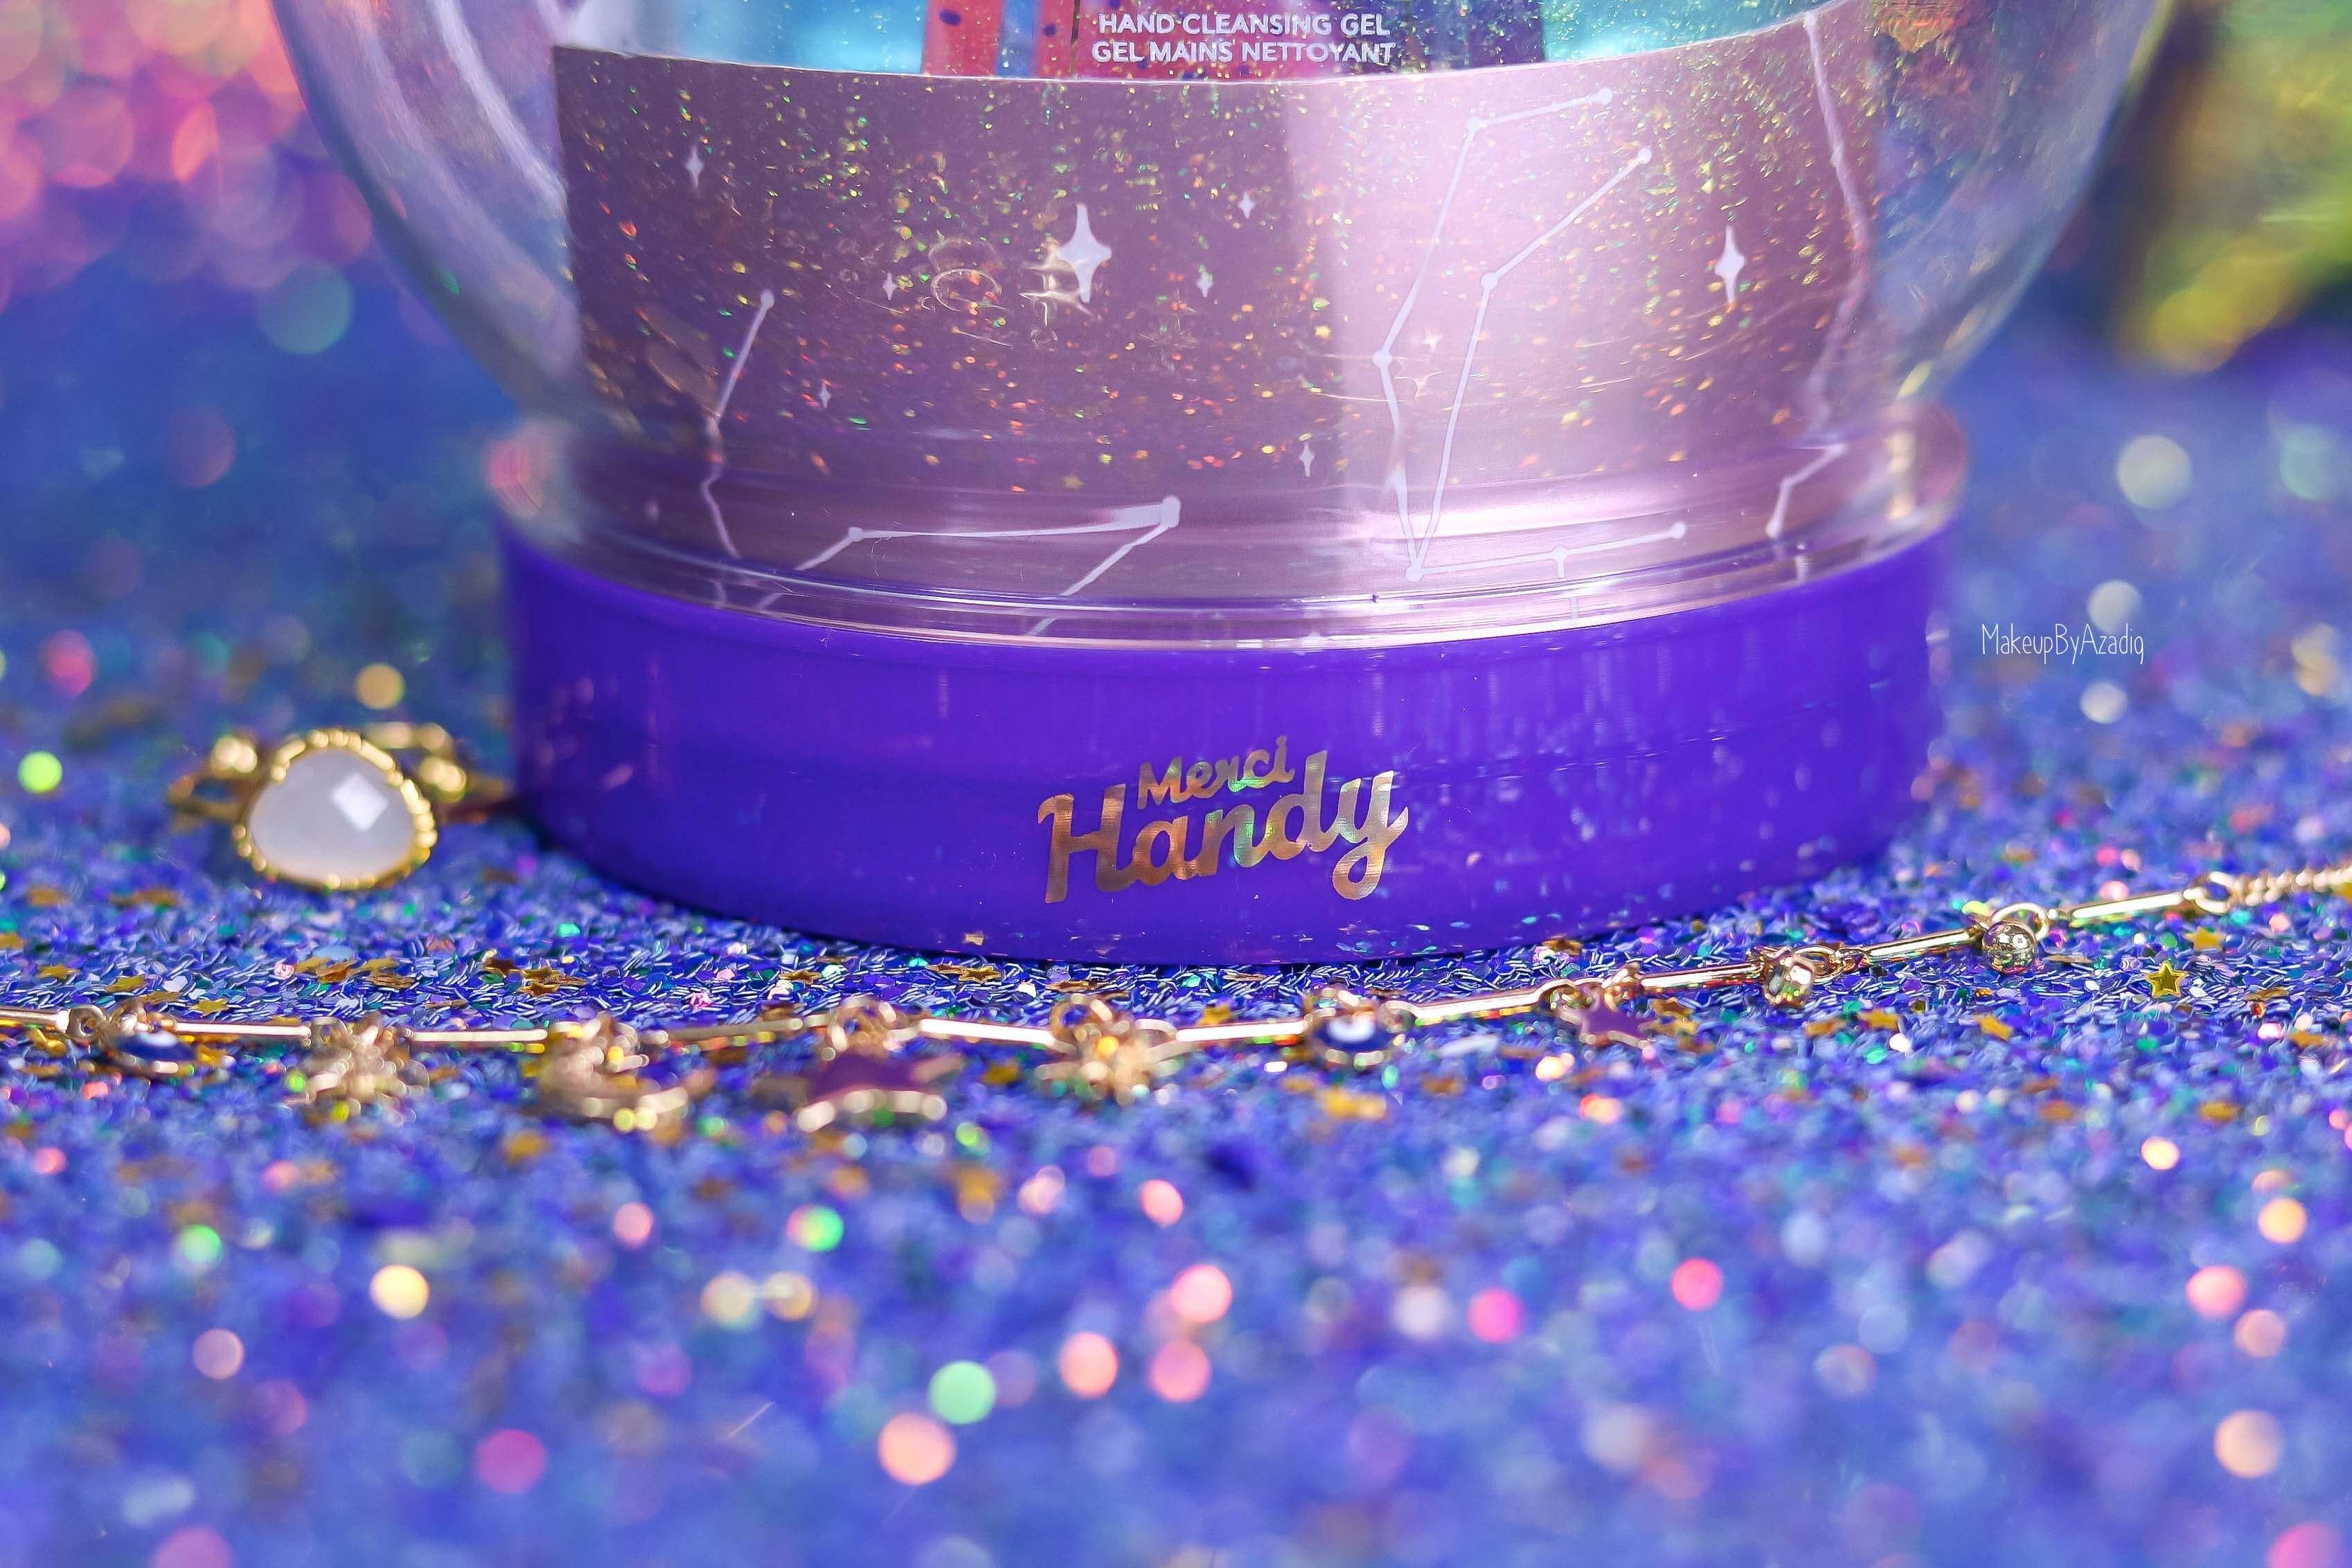 revue-coffret-collection-gel-antibacteriens-merci-handy-crystal-ball-mystique-makeupbyazadig-new-avis-prix-senteur-sephora-france-logo